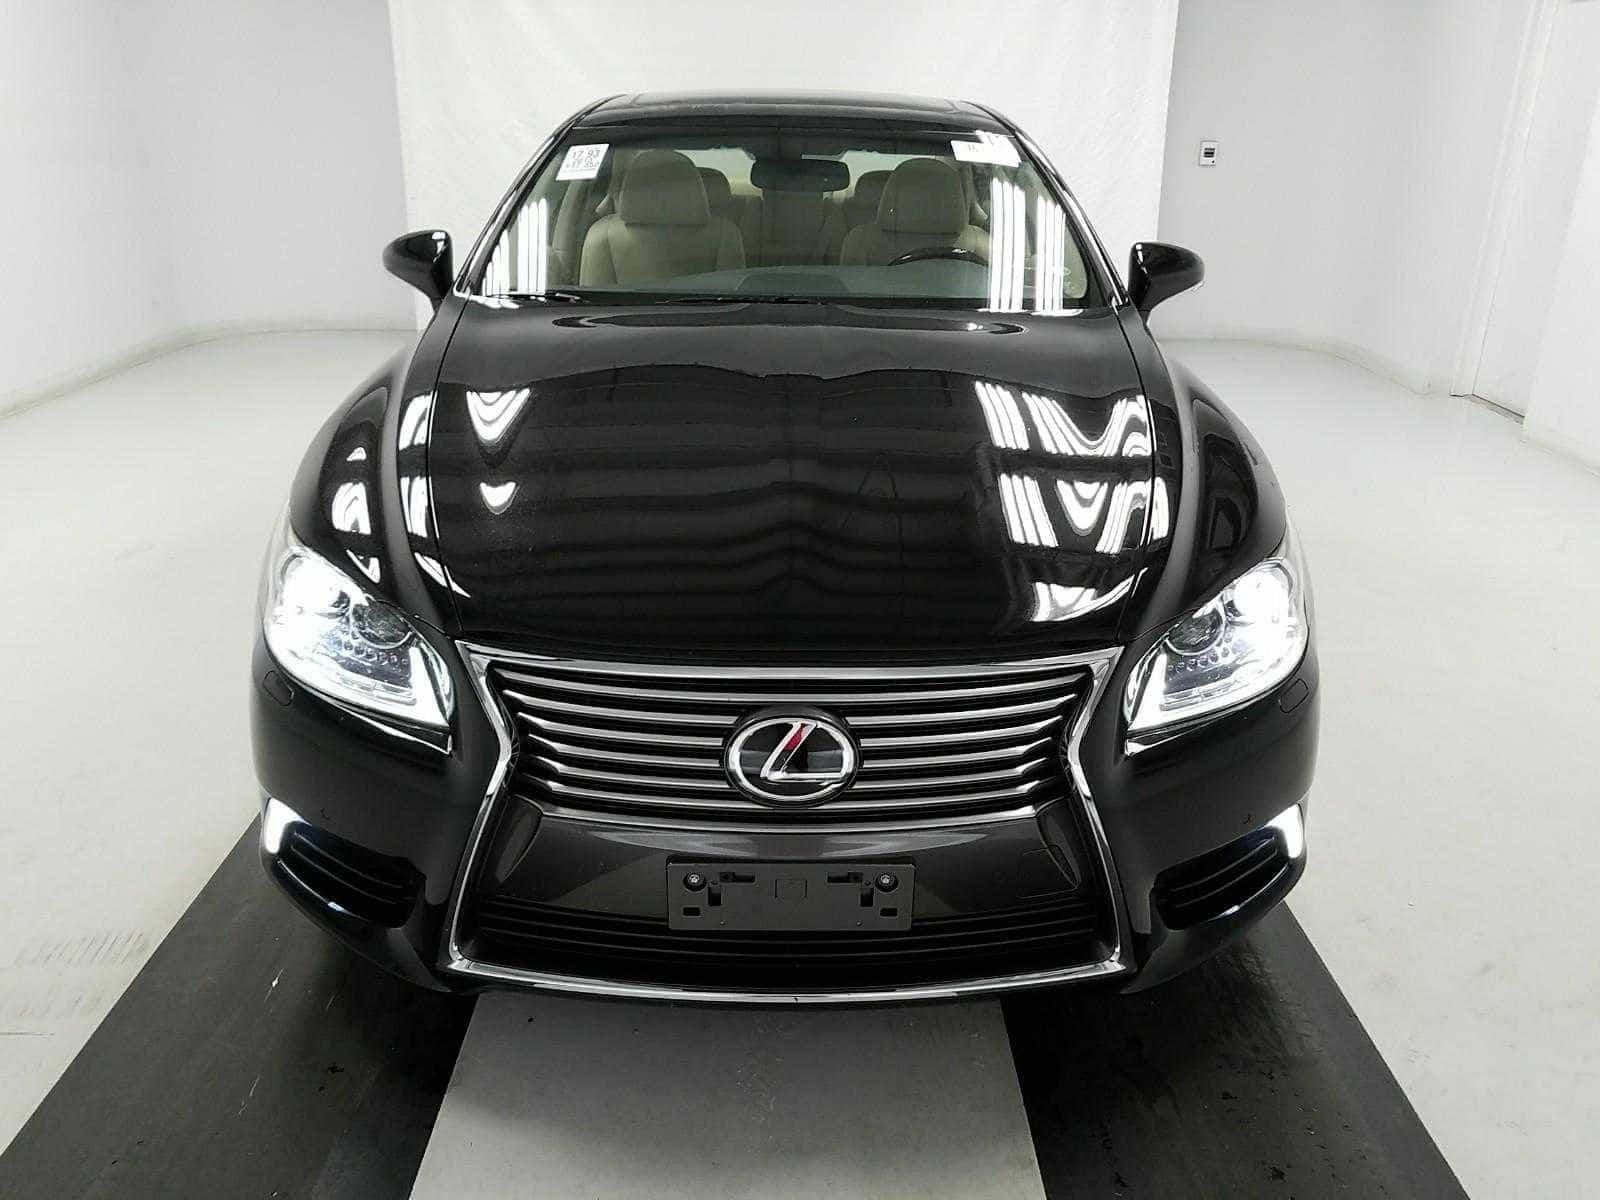 New Lexus front view